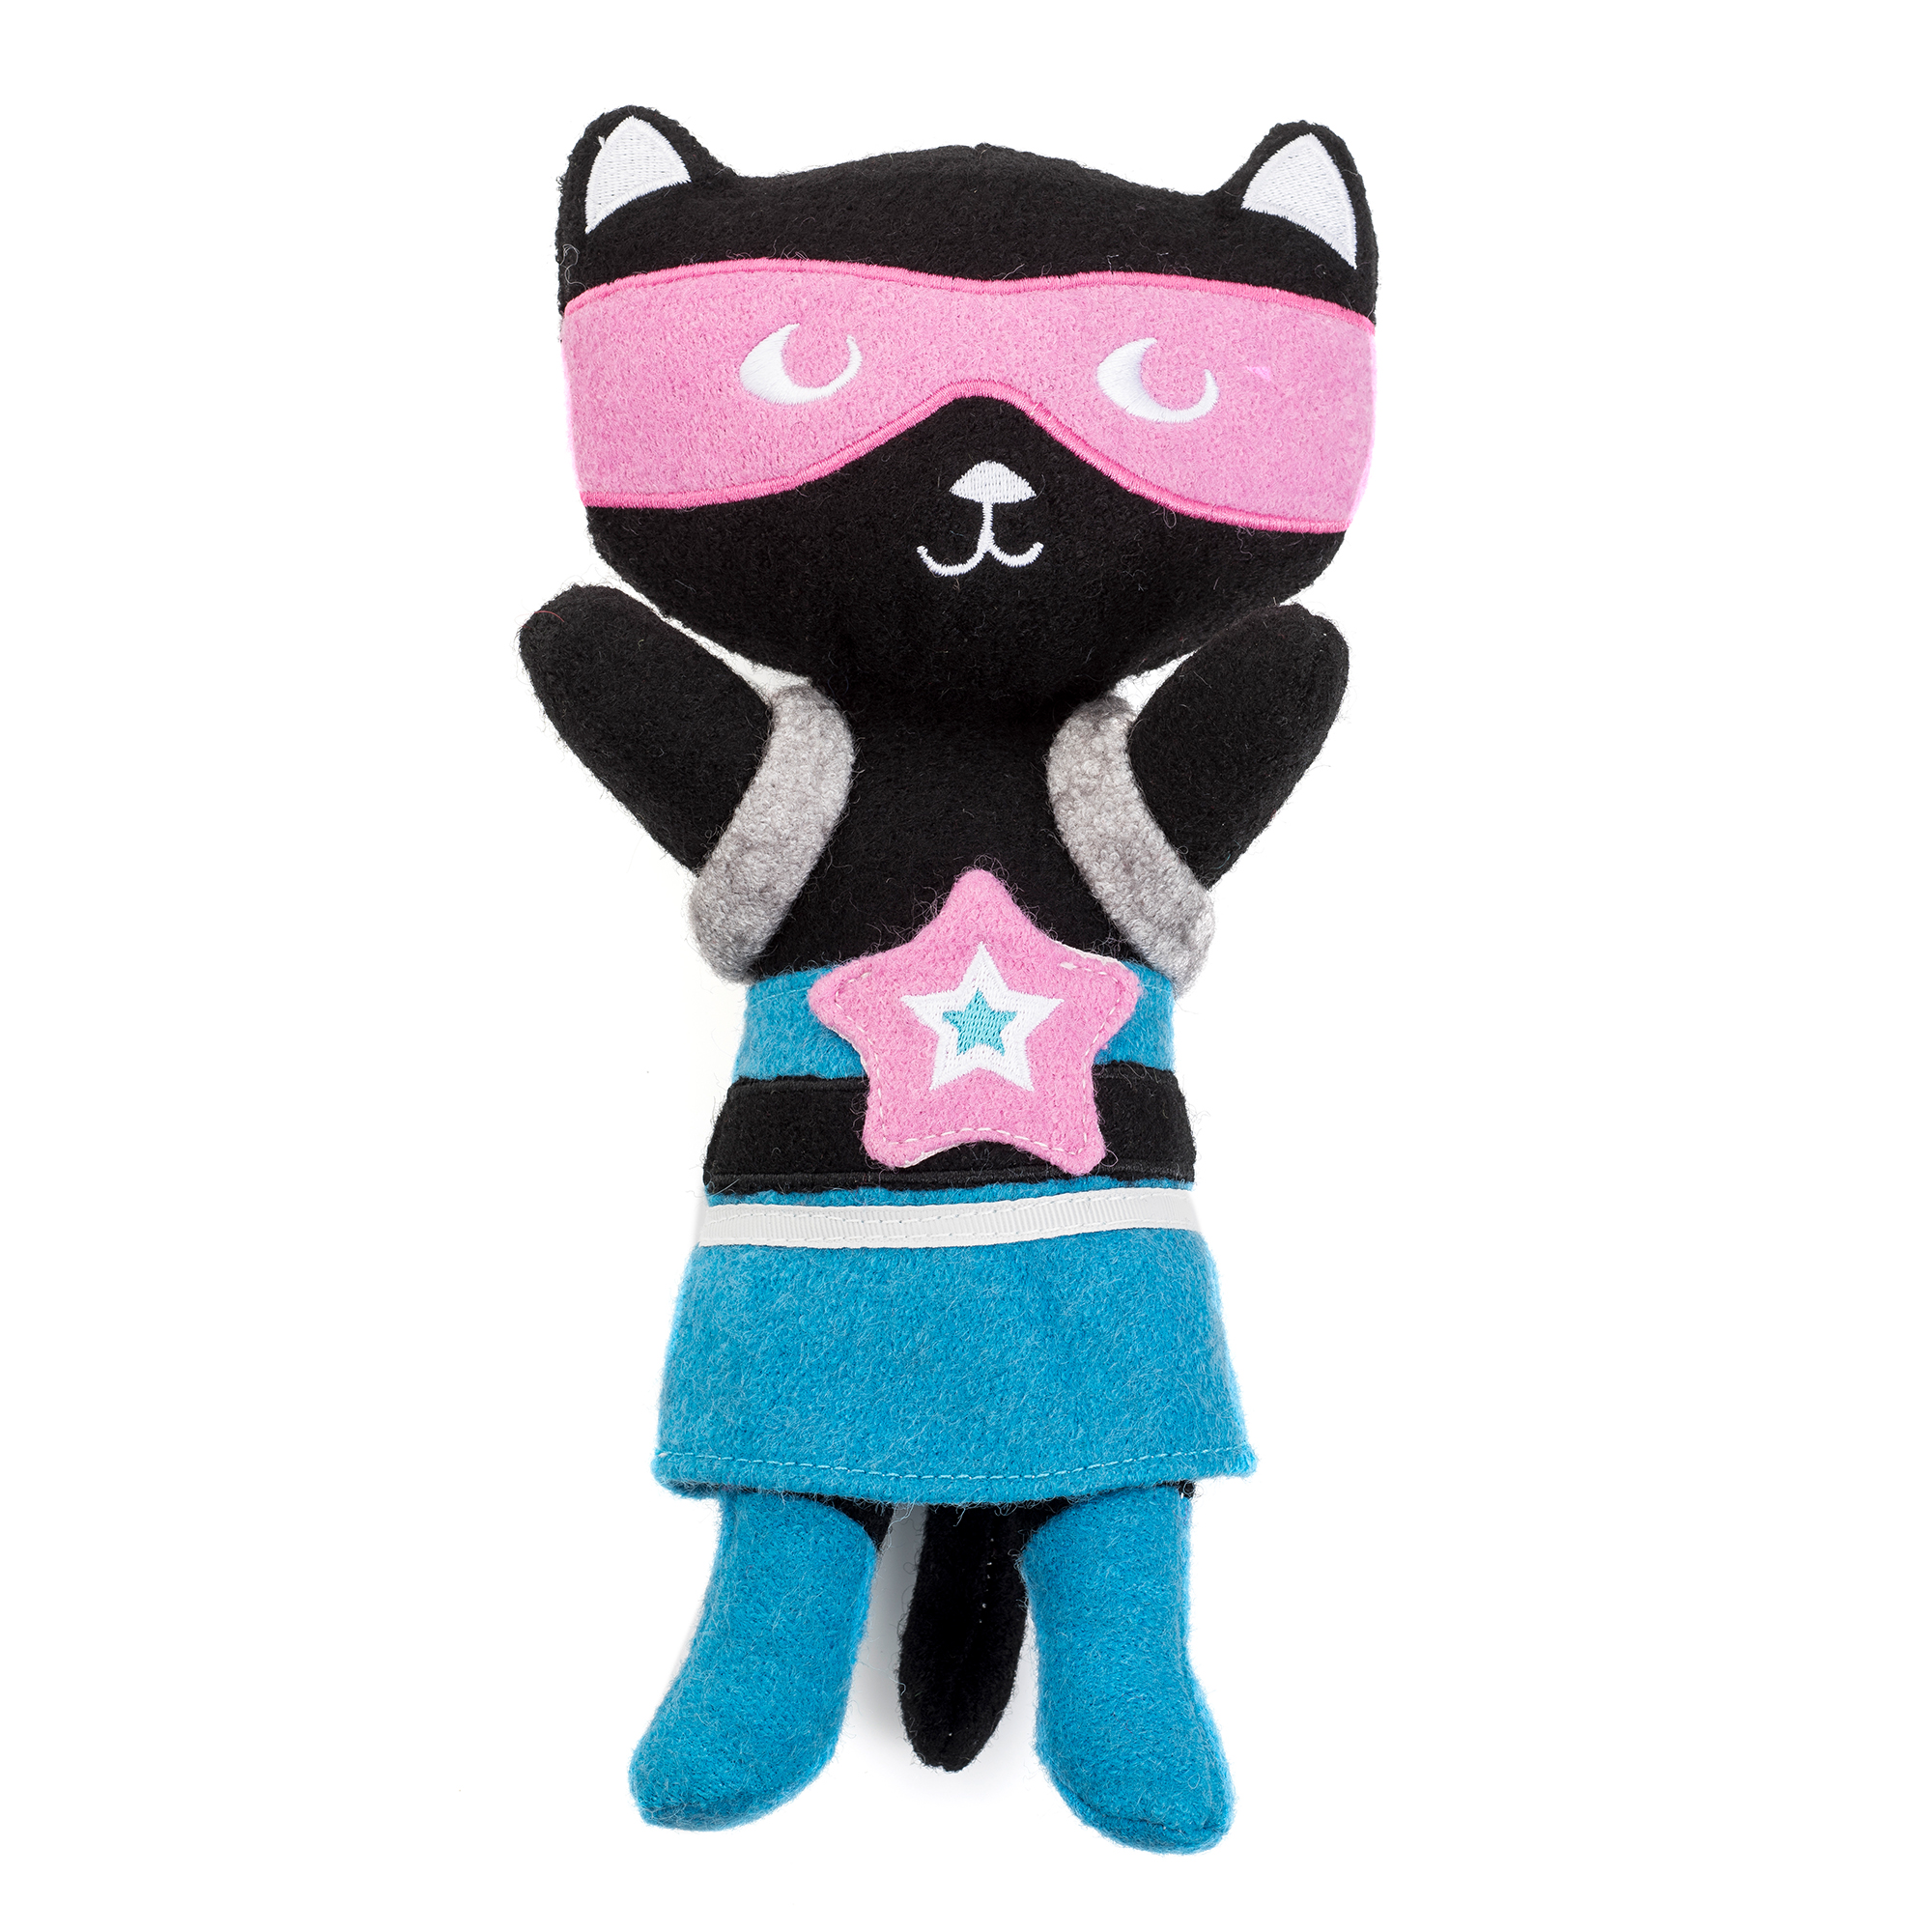 toy_woolie_superhero_cat_front_2000x2000_300.jpg